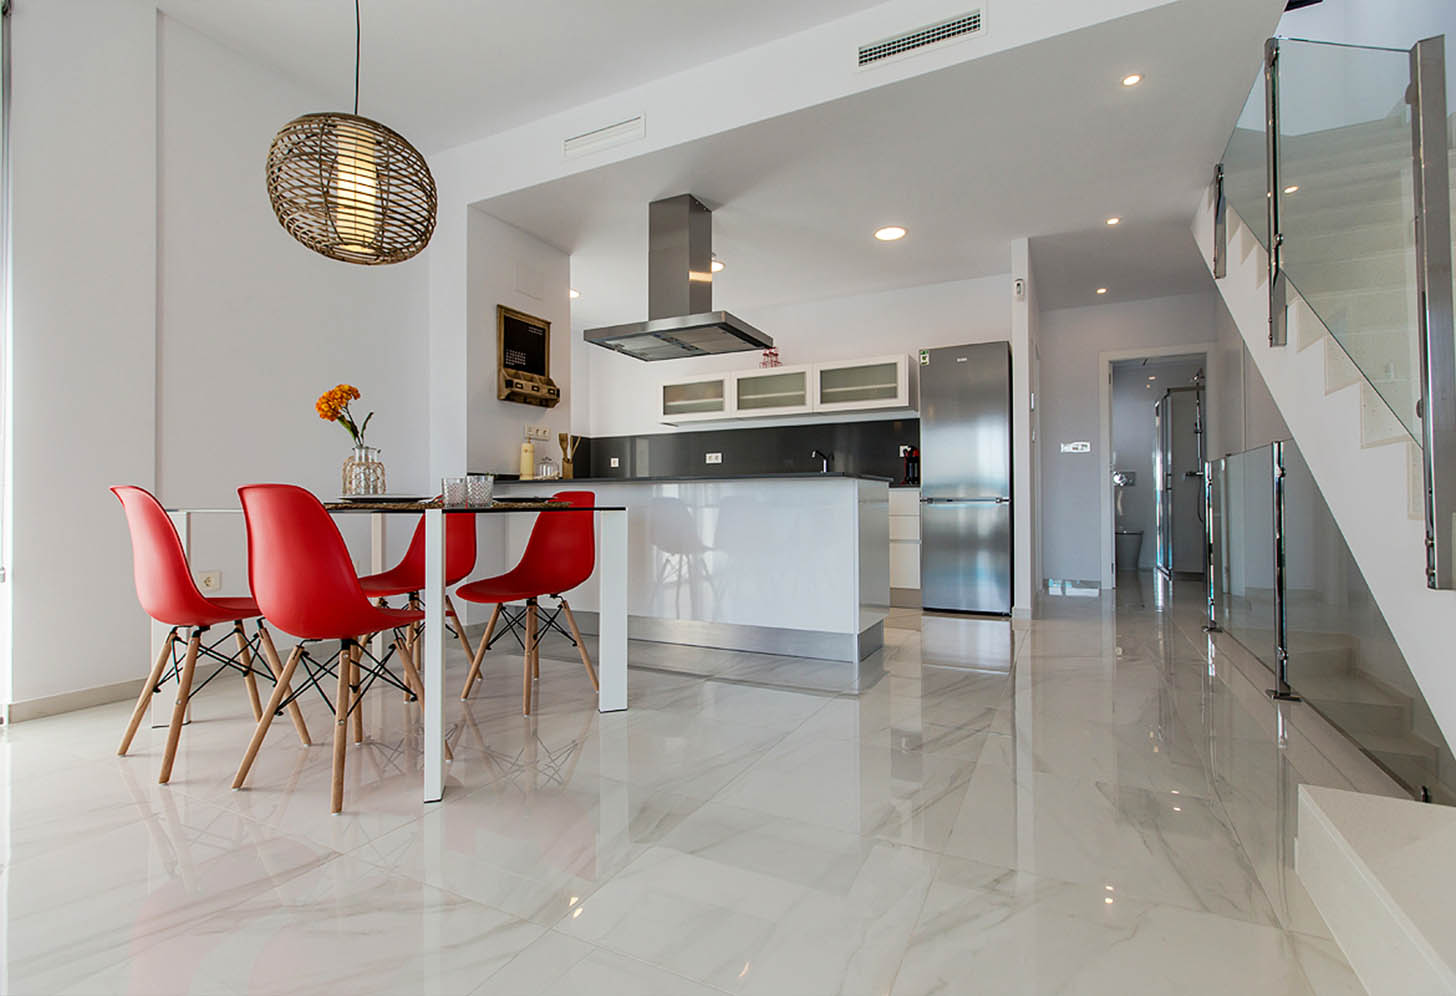 immobilier neuf espagne costa blanca nord on-f2 benijofar villas cuisine